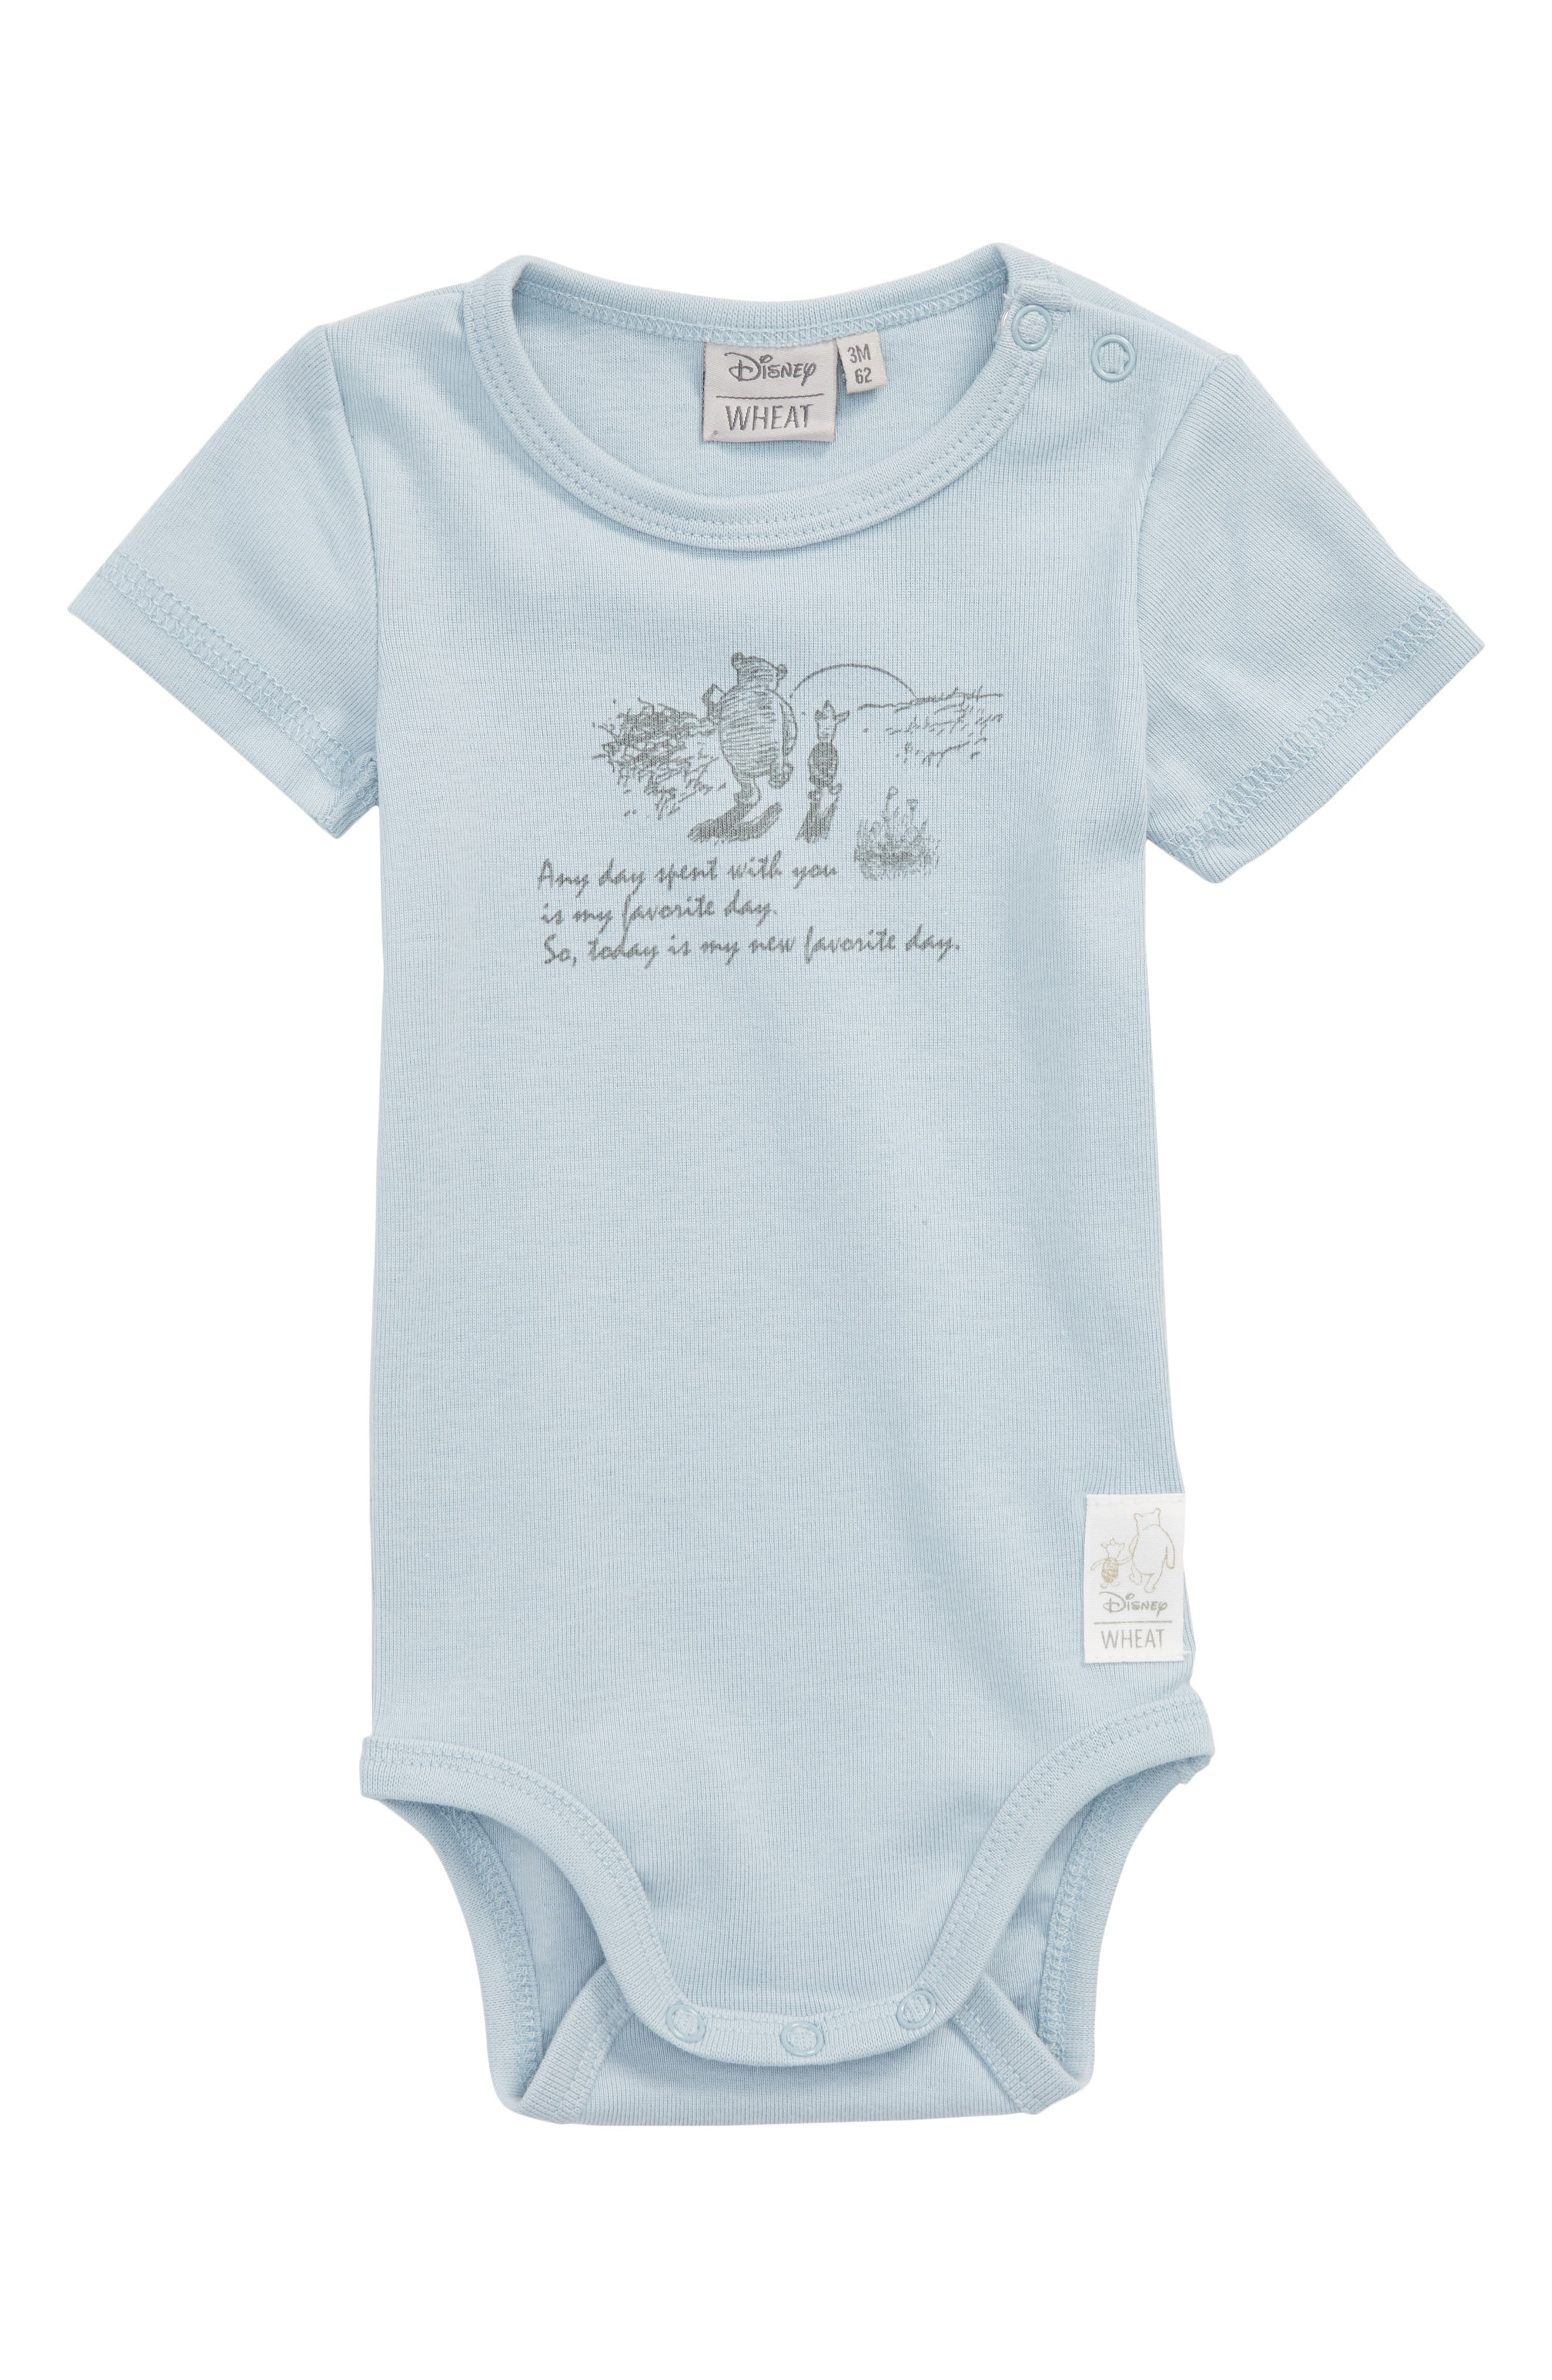 x Disney<sup>®</sup> Winnie the Pooh - Favorite Day Organic Cotton Bodysuit,                         Main,                         color, Sky